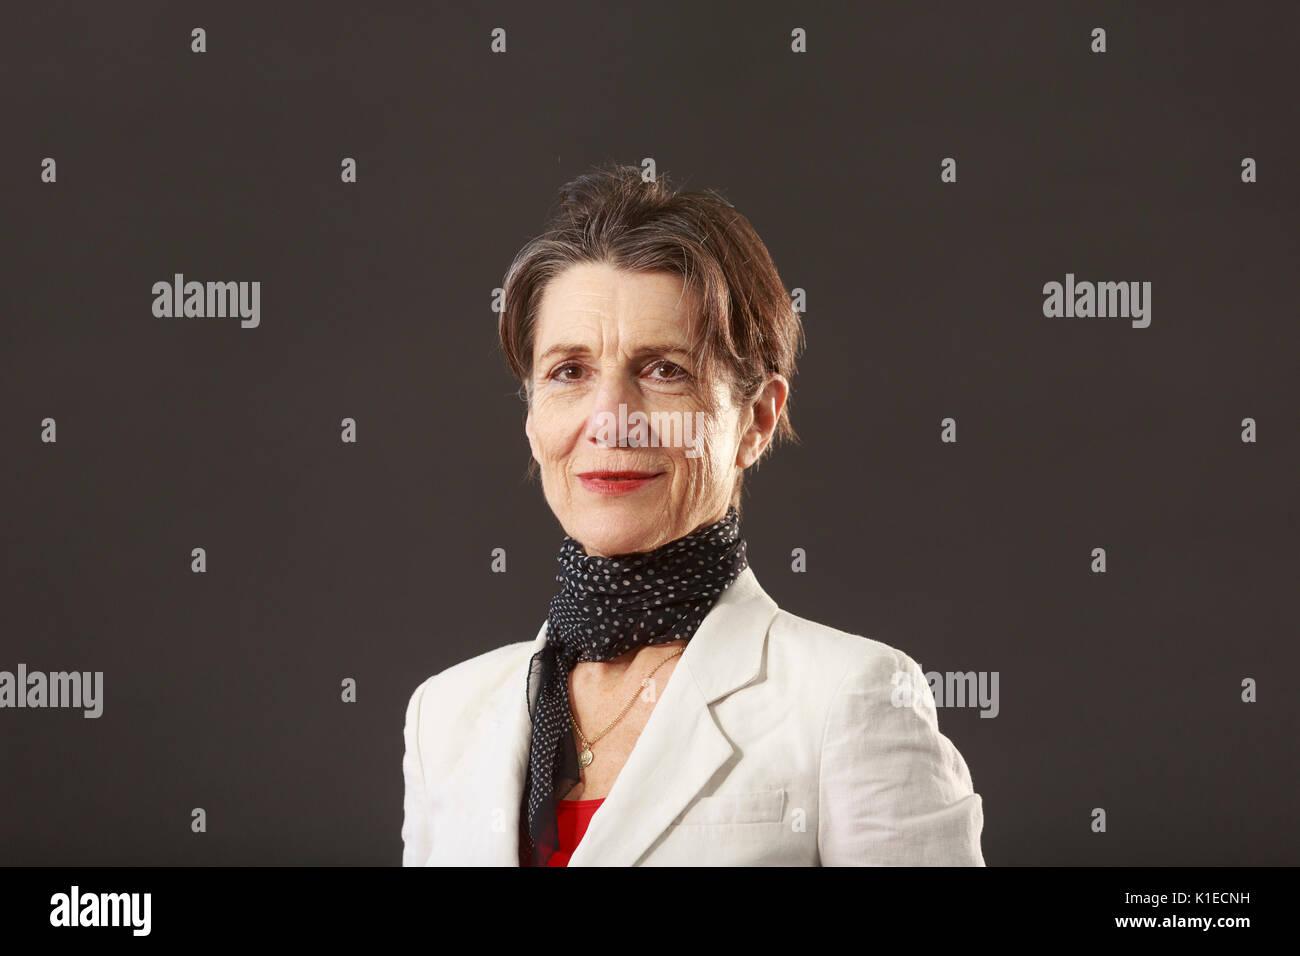 Pat Thornton,Emily Mortimer (born 1971 (naturalized American citizen) Adult picture Intira Jaroenpura,Mouli Ganguly 2000